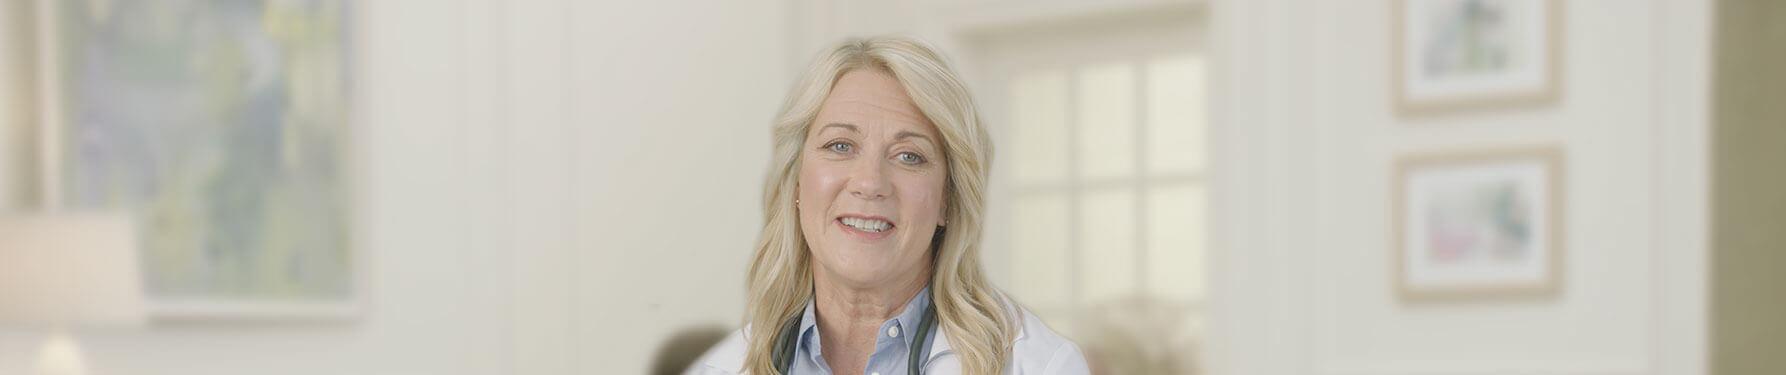 Nurse video